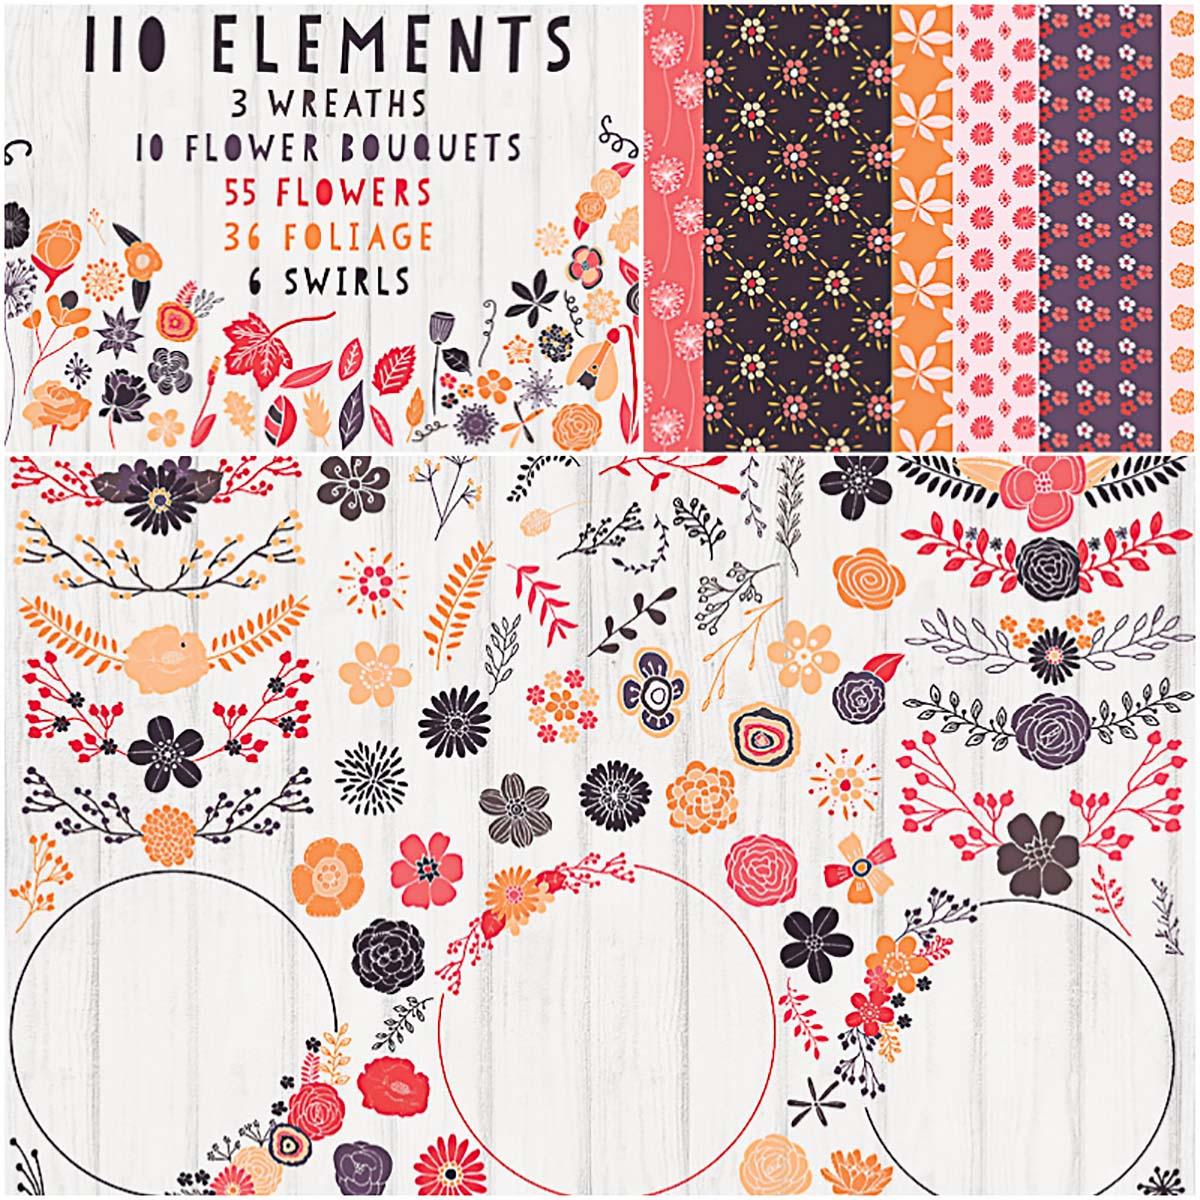 Floral clipart and patterns beautiful bundle set